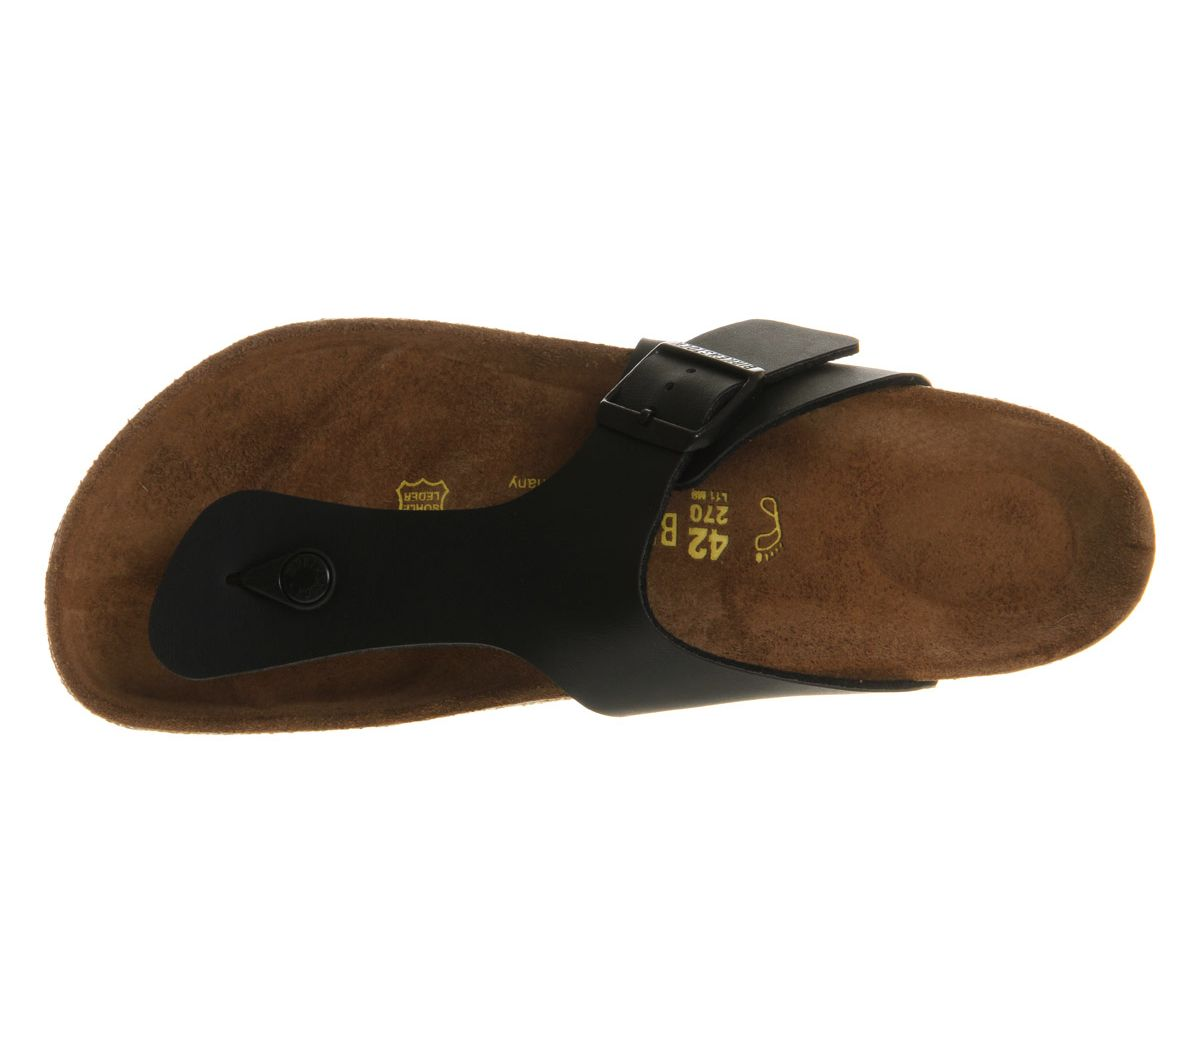 37f4b63e8ed Birkenstock Ramses Thong Sandals Black - Sandals